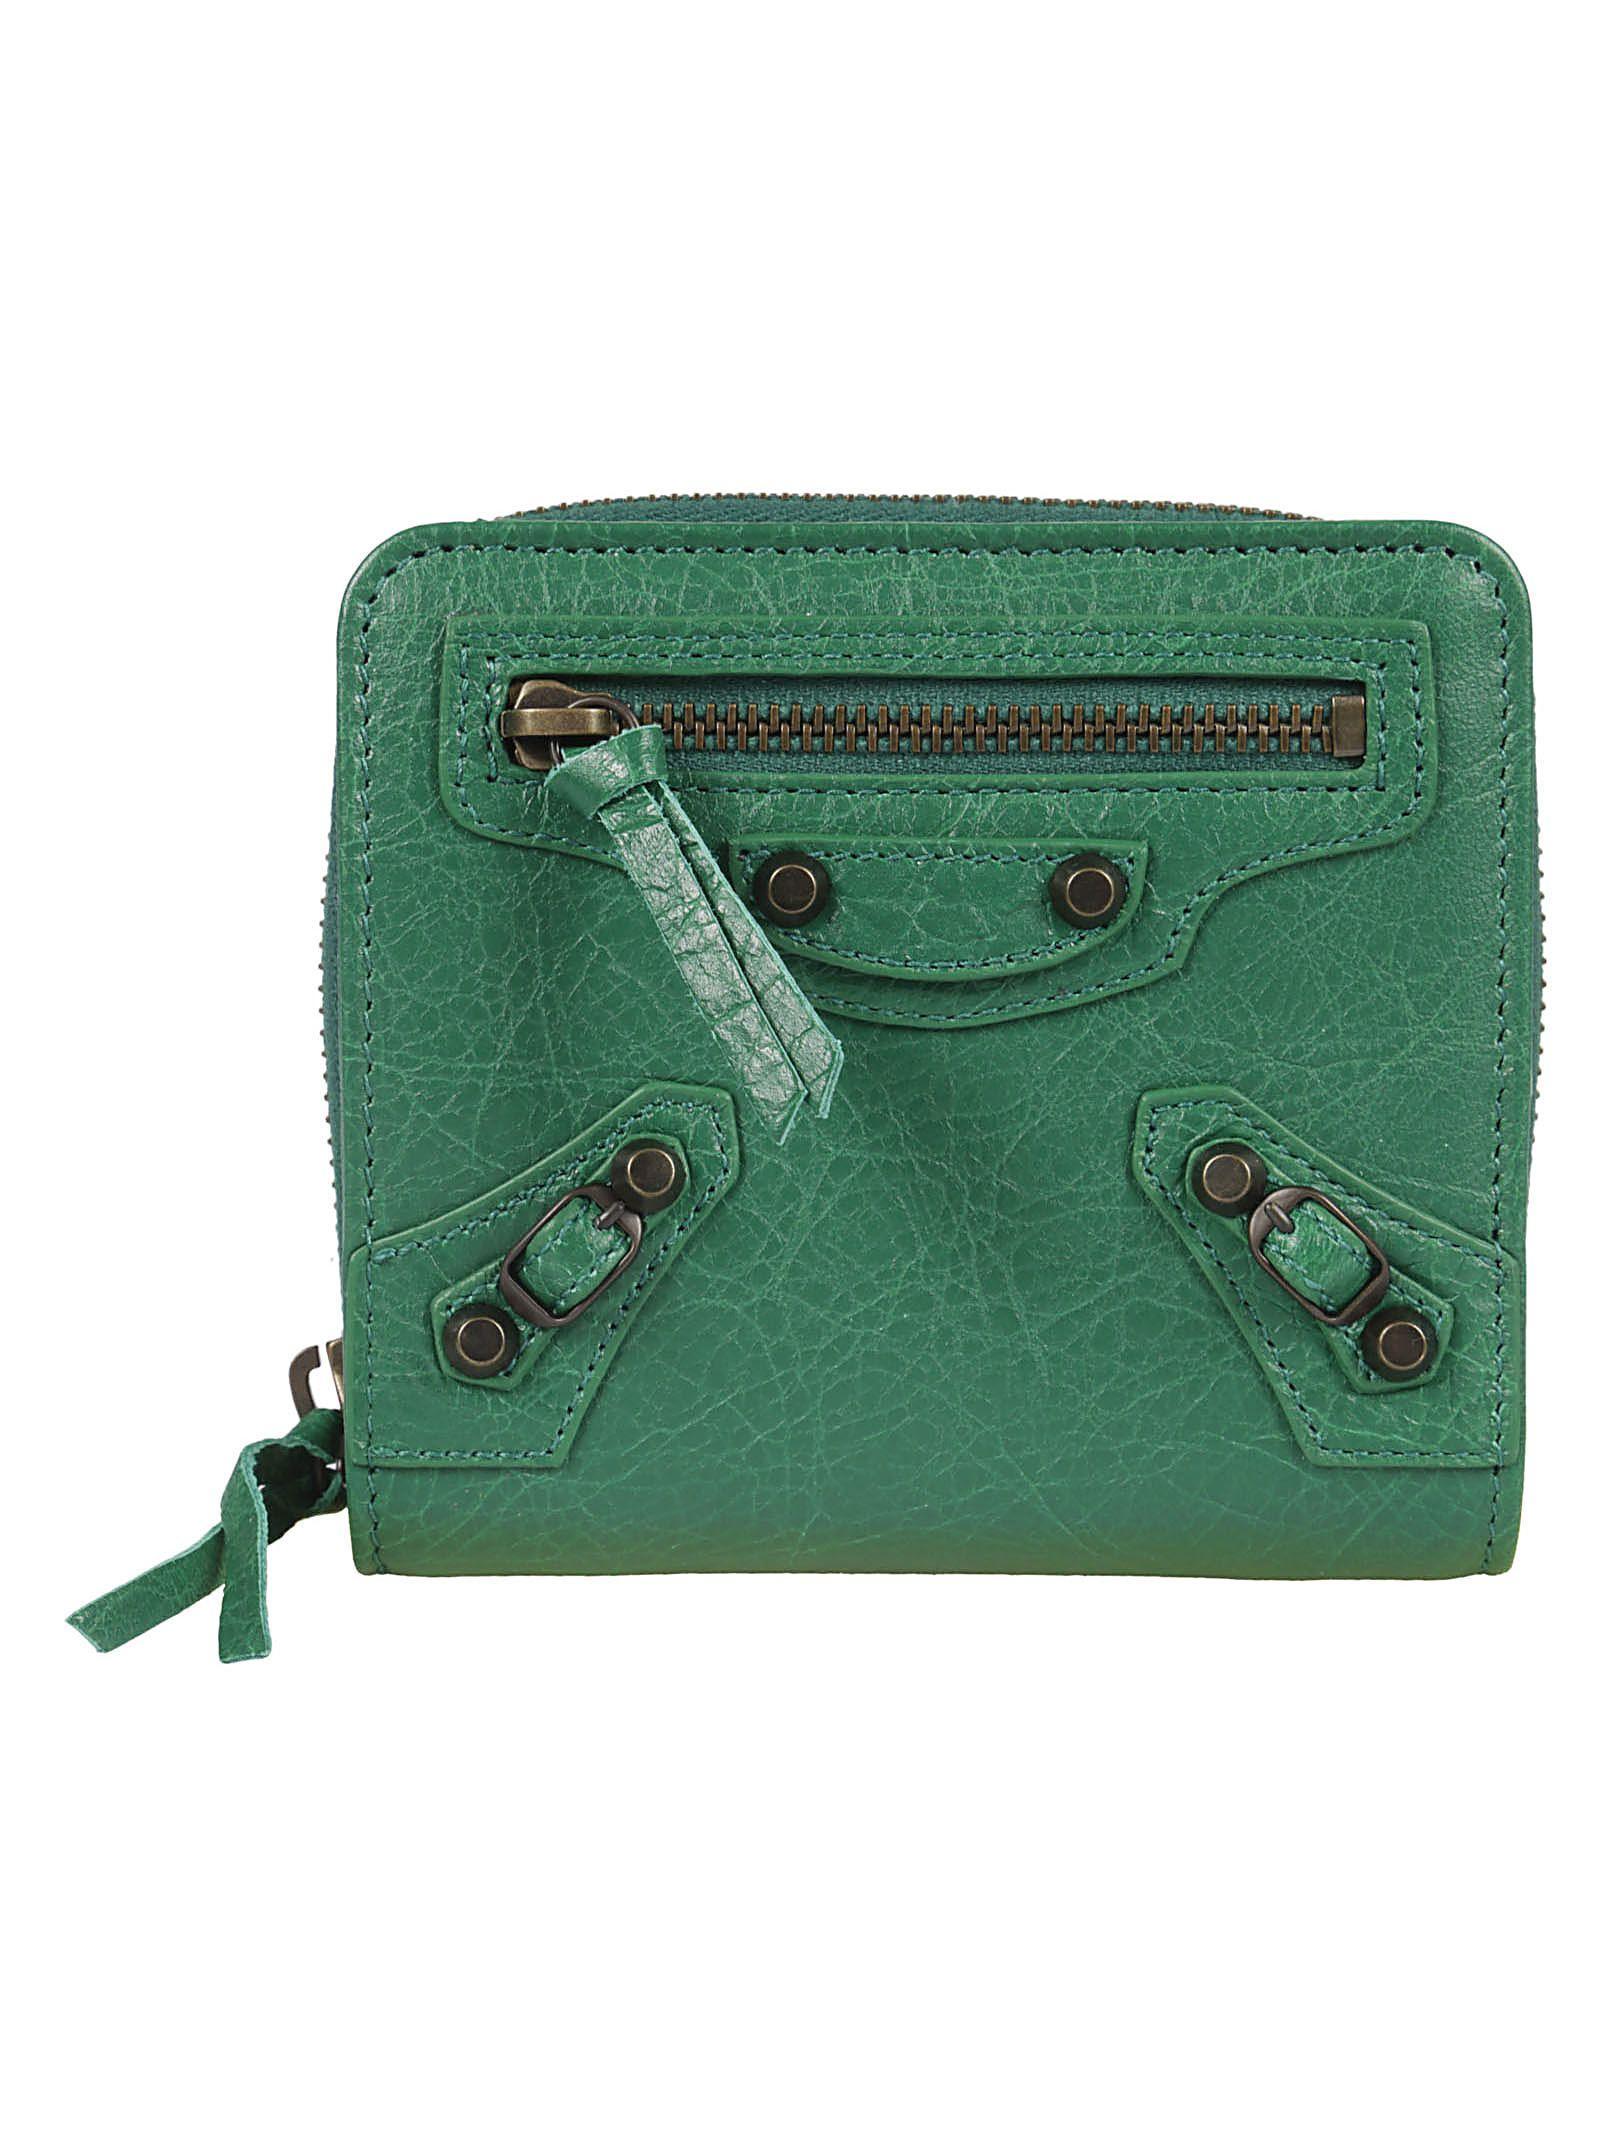 Balenciaga Classic French Wallet In Vert